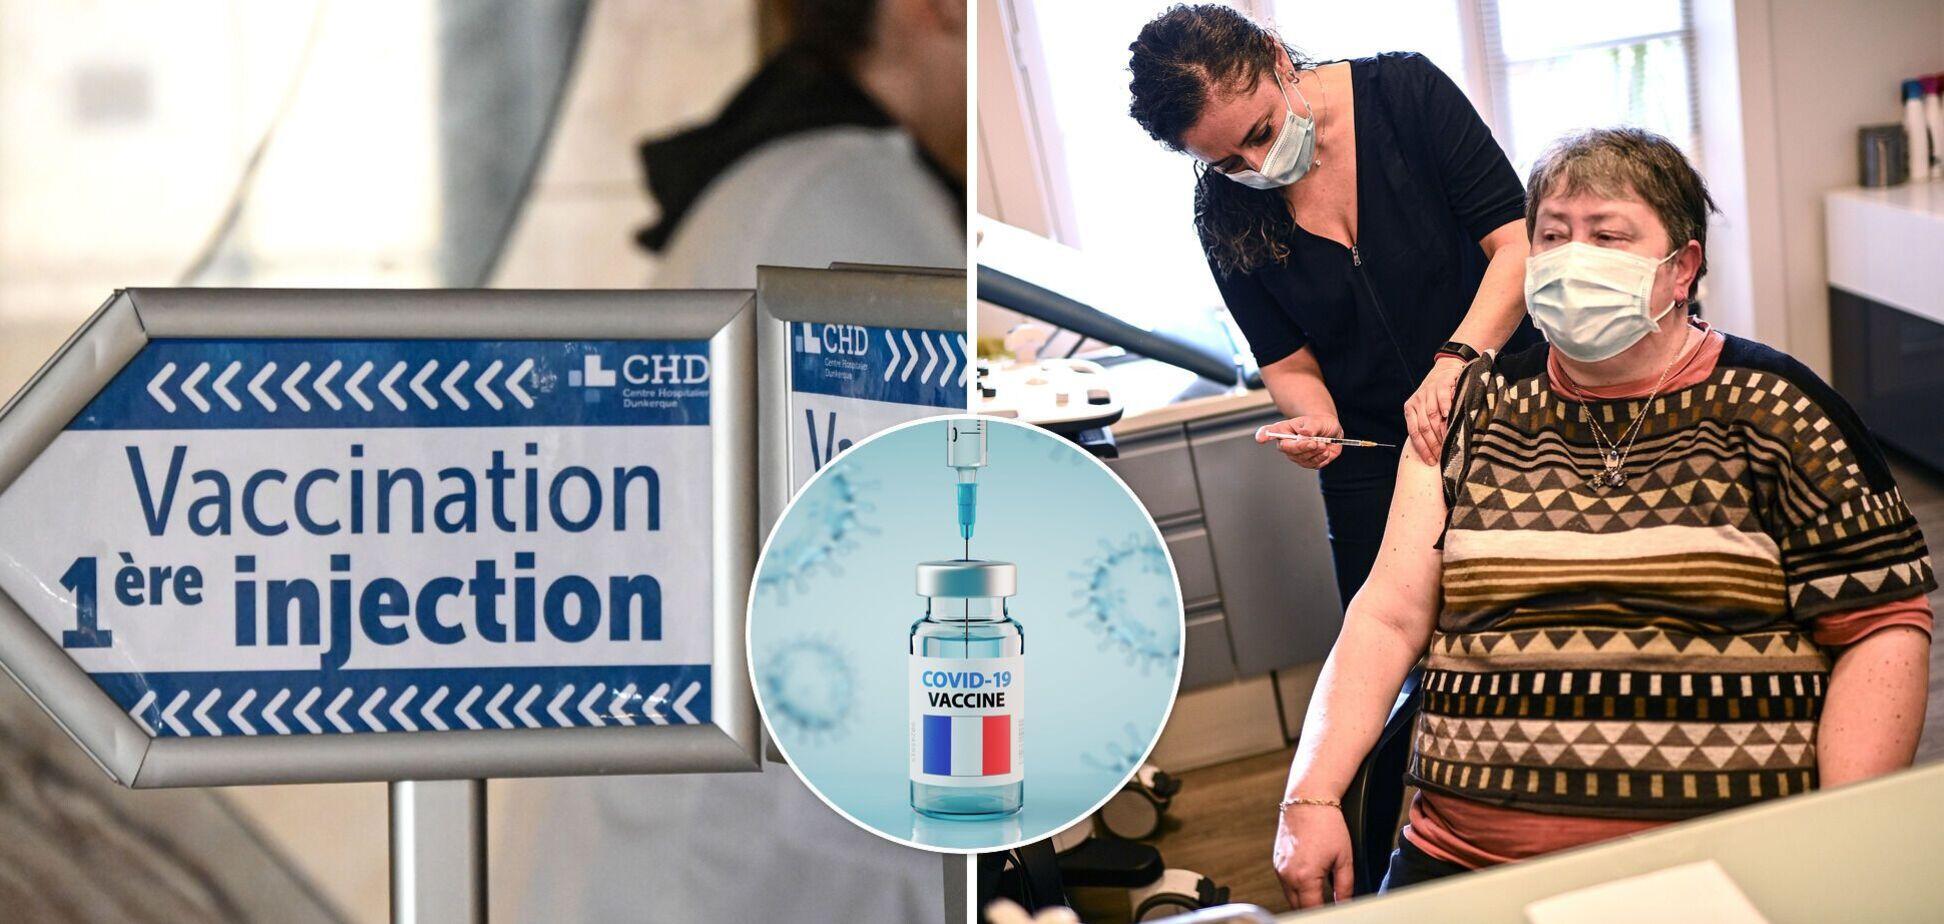 Украинка о вакцинации от COVID-19 во Франции: пока процесс идет слабо